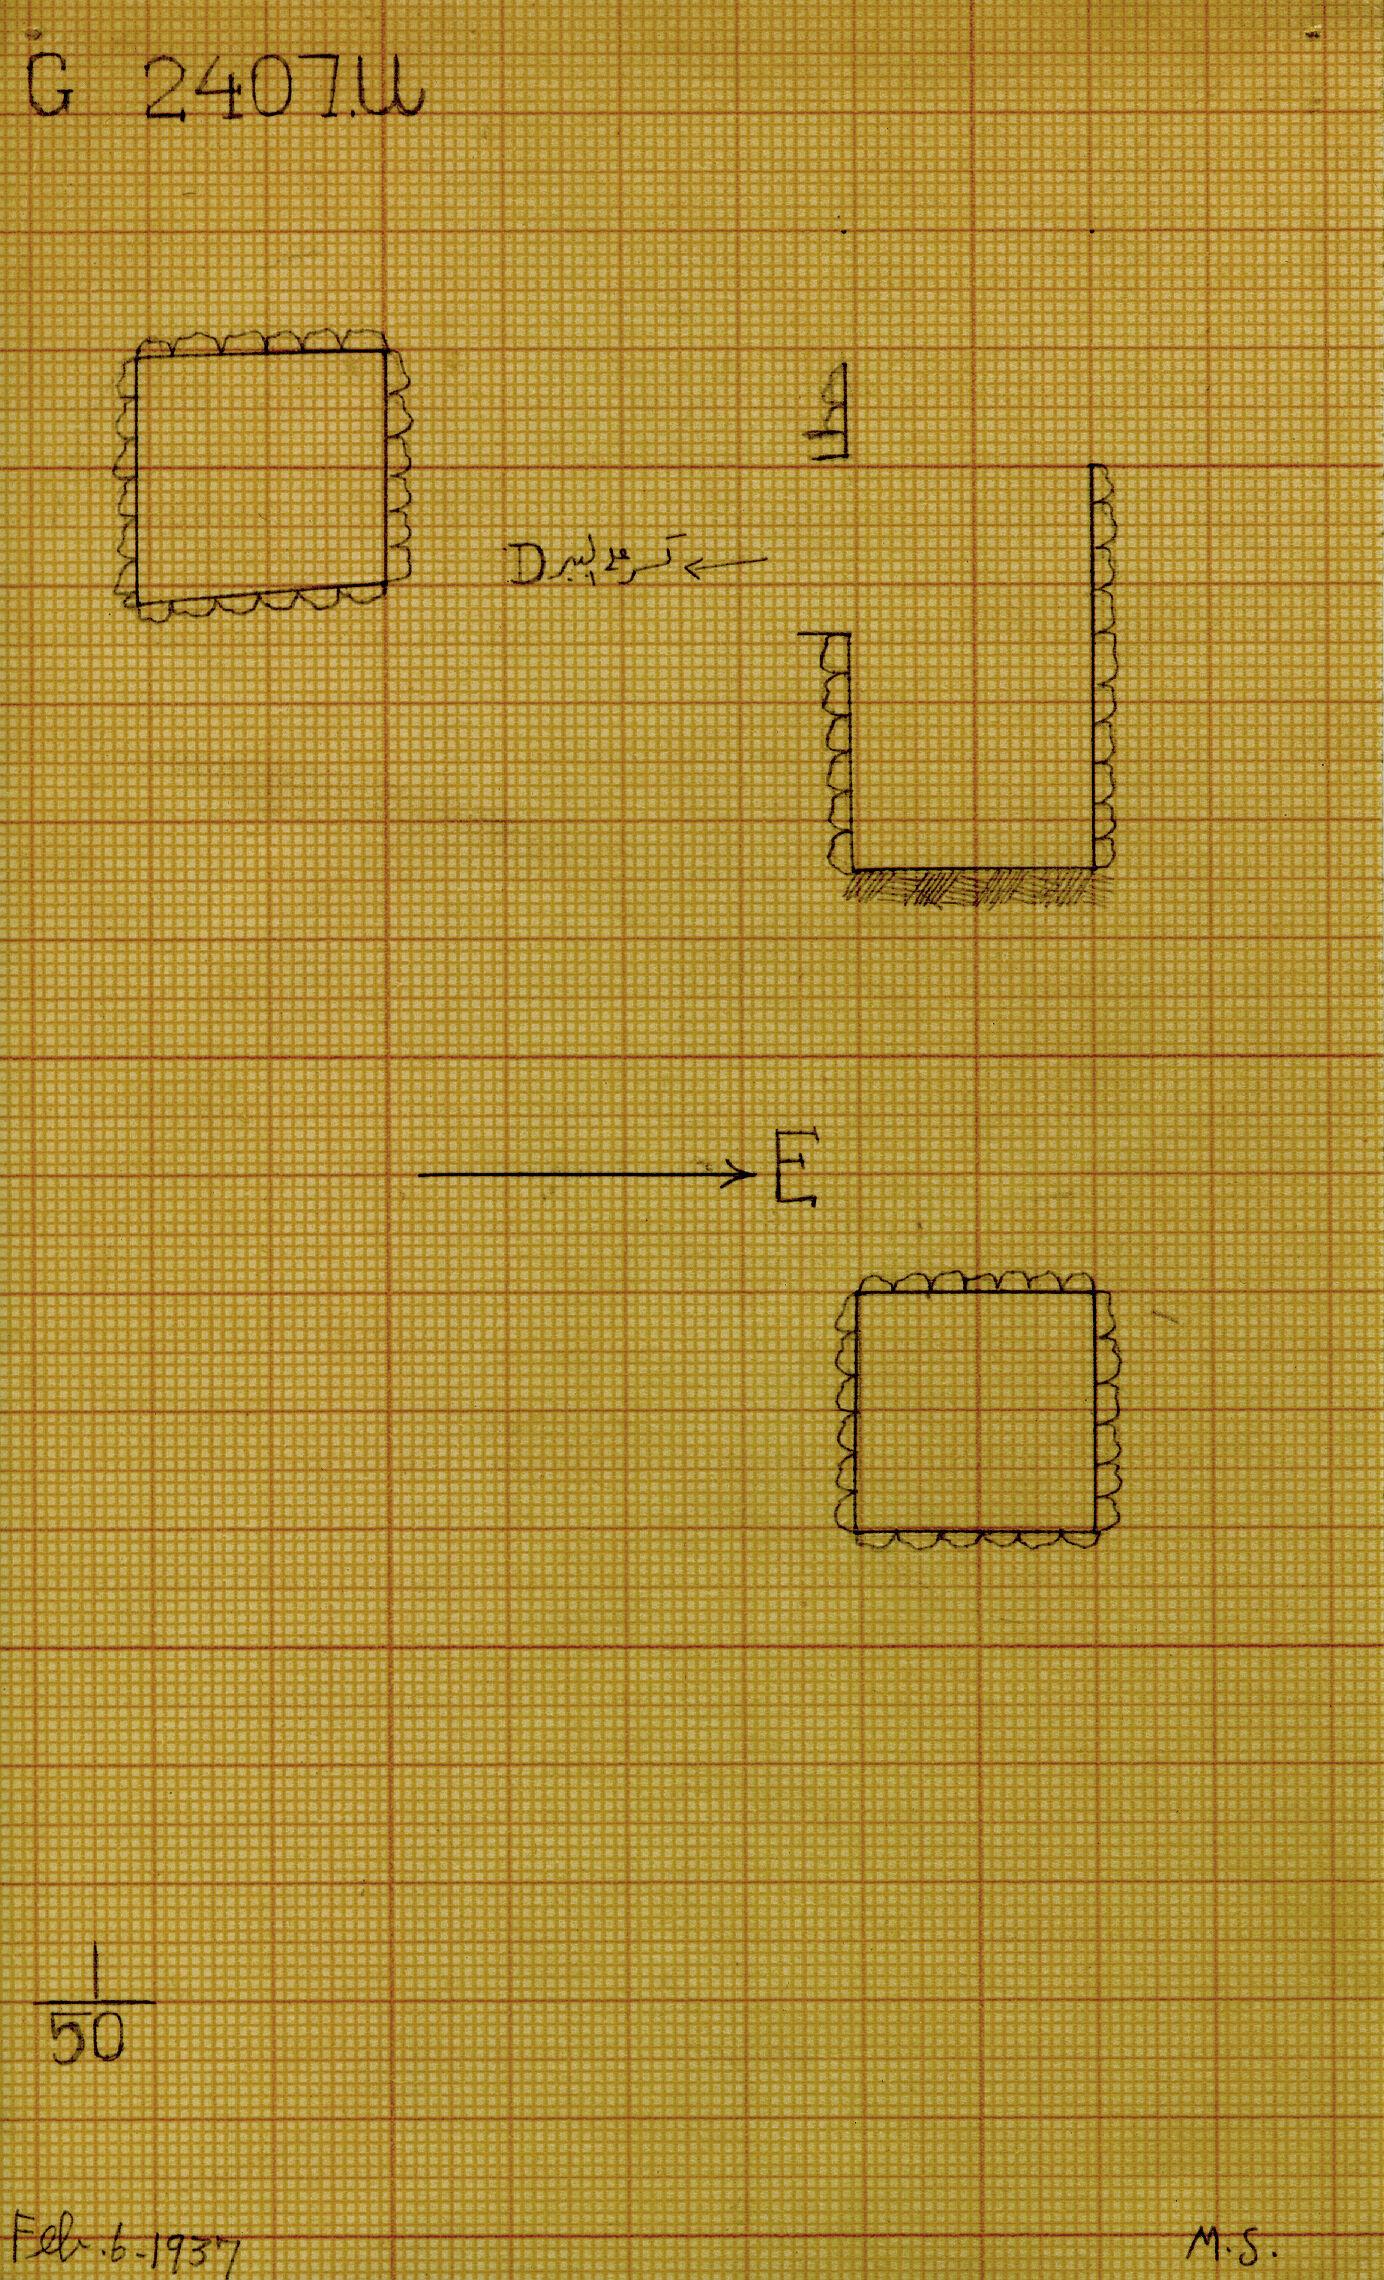 Maps and plans: G 2407, Shaft U